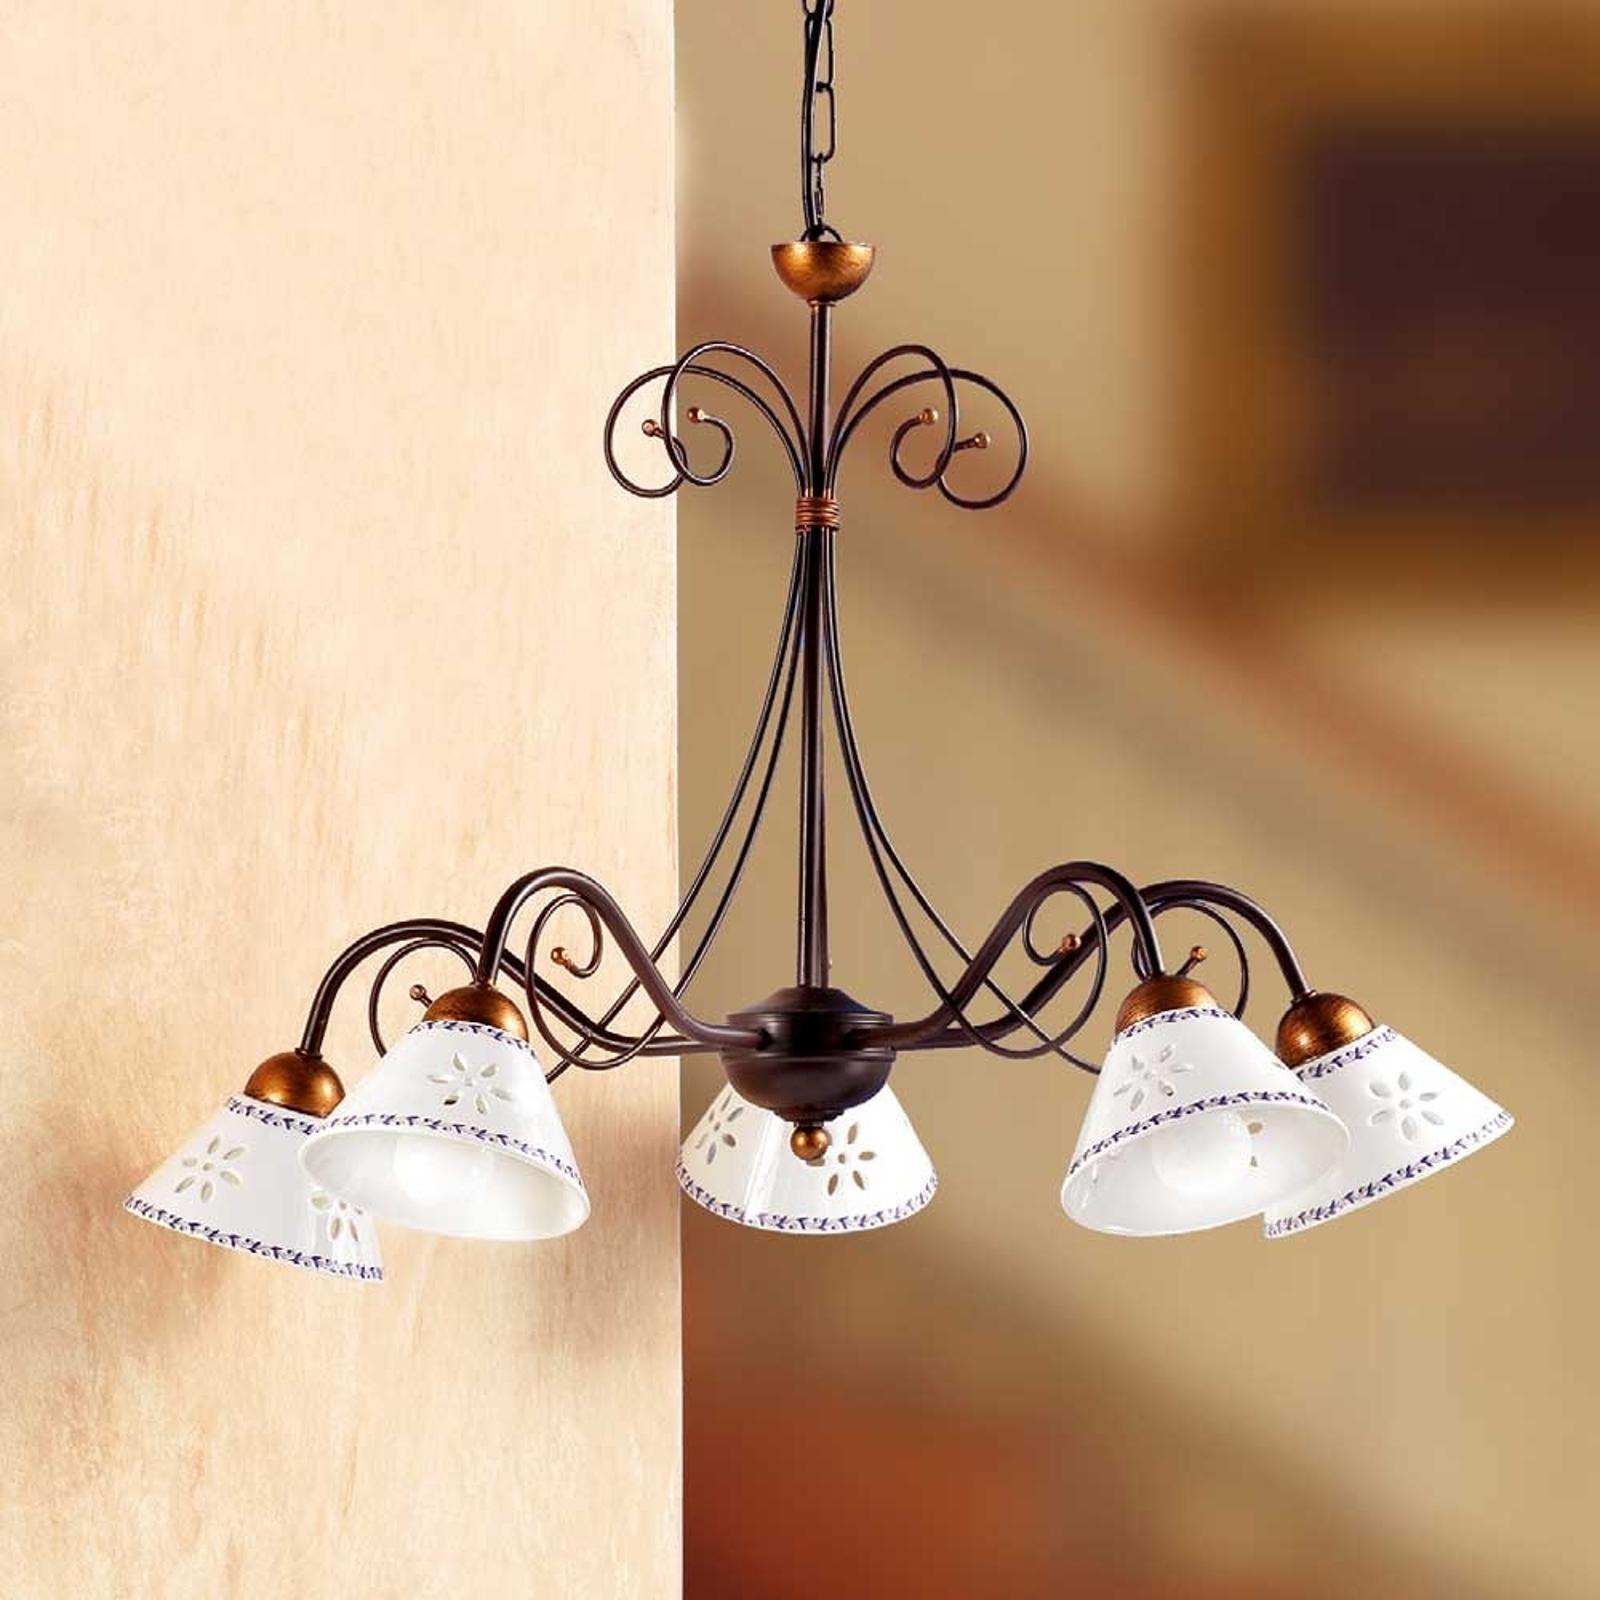 Romantic LIBERTY hanging light, 5-bulb_2013034_1